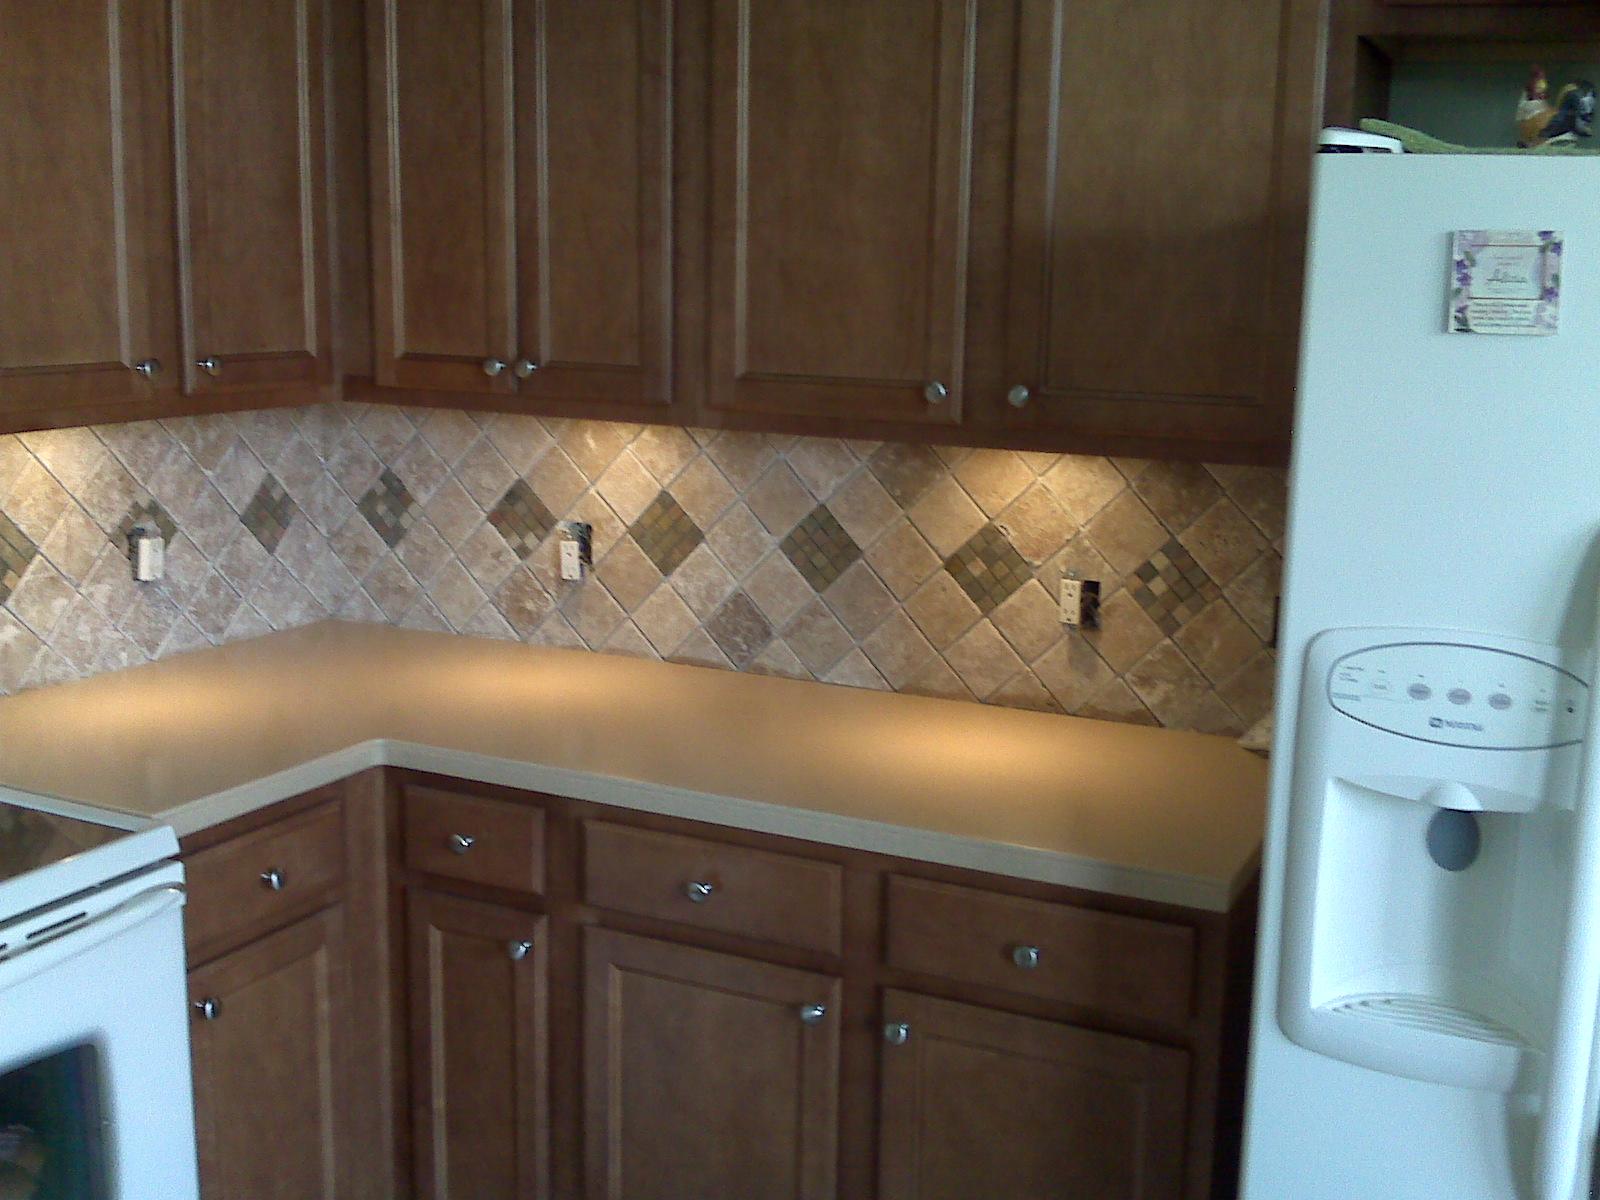 tumbled marble backsplash with under counter lighting